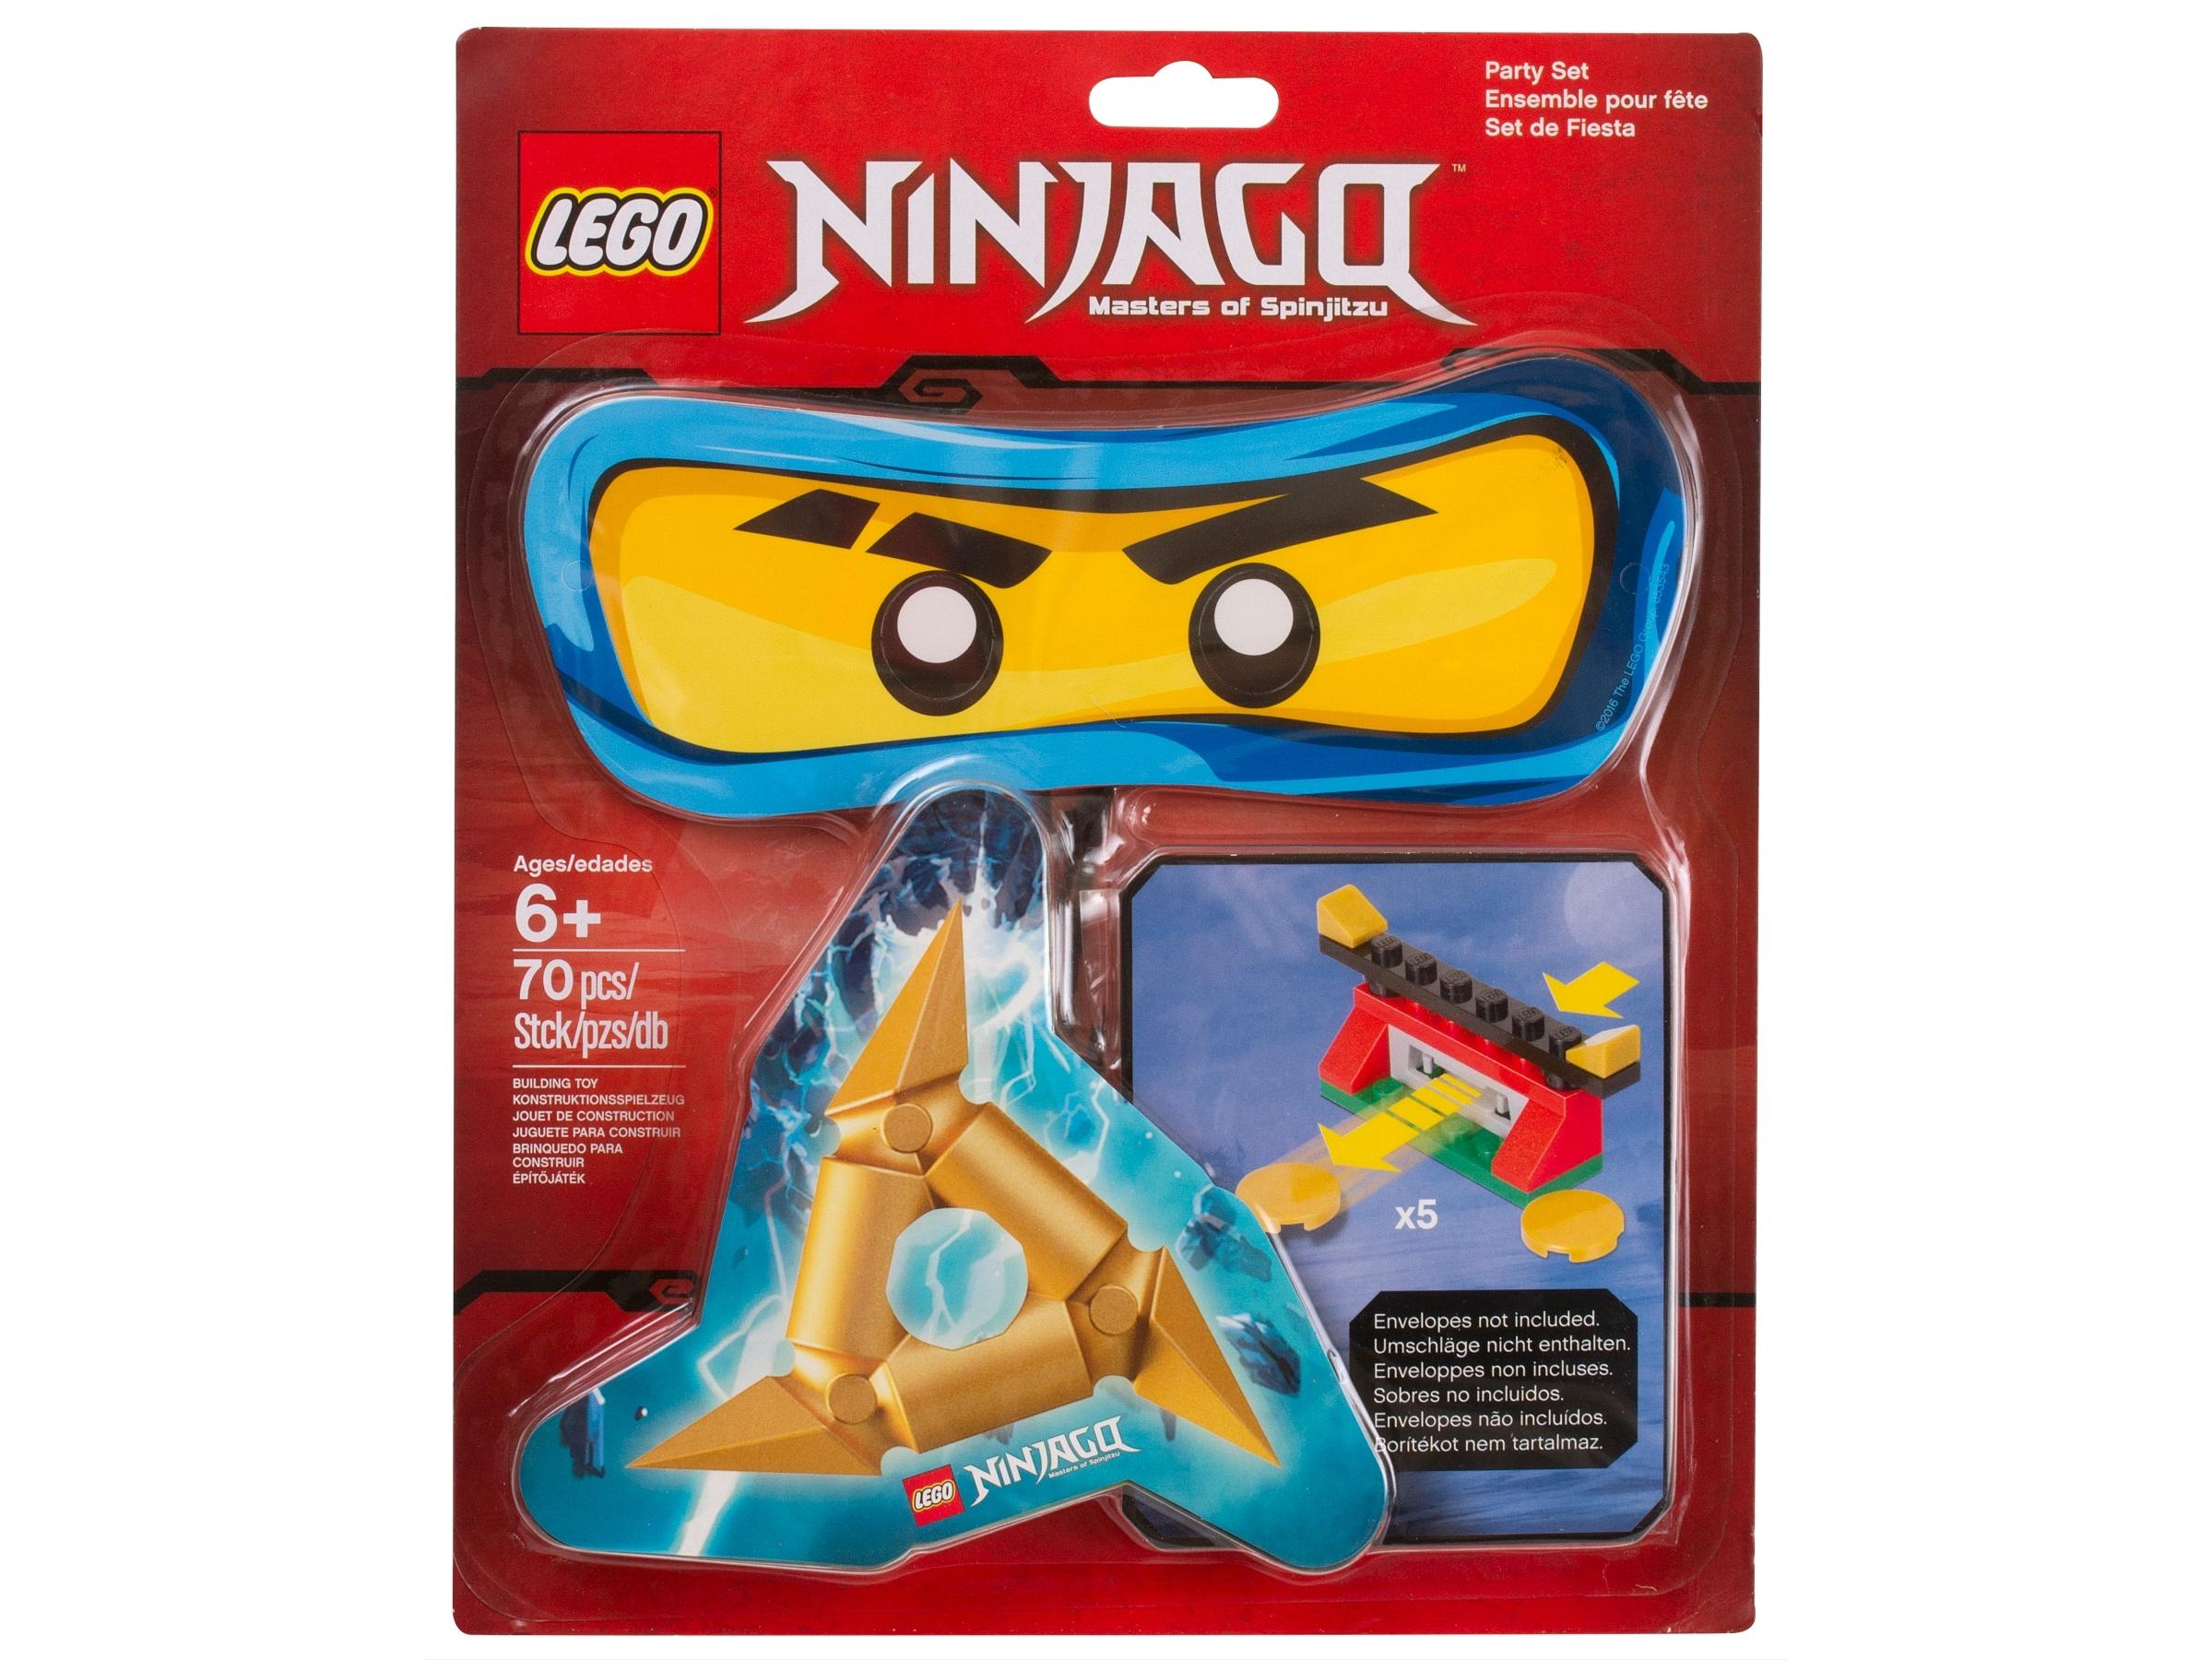 ninjago party set